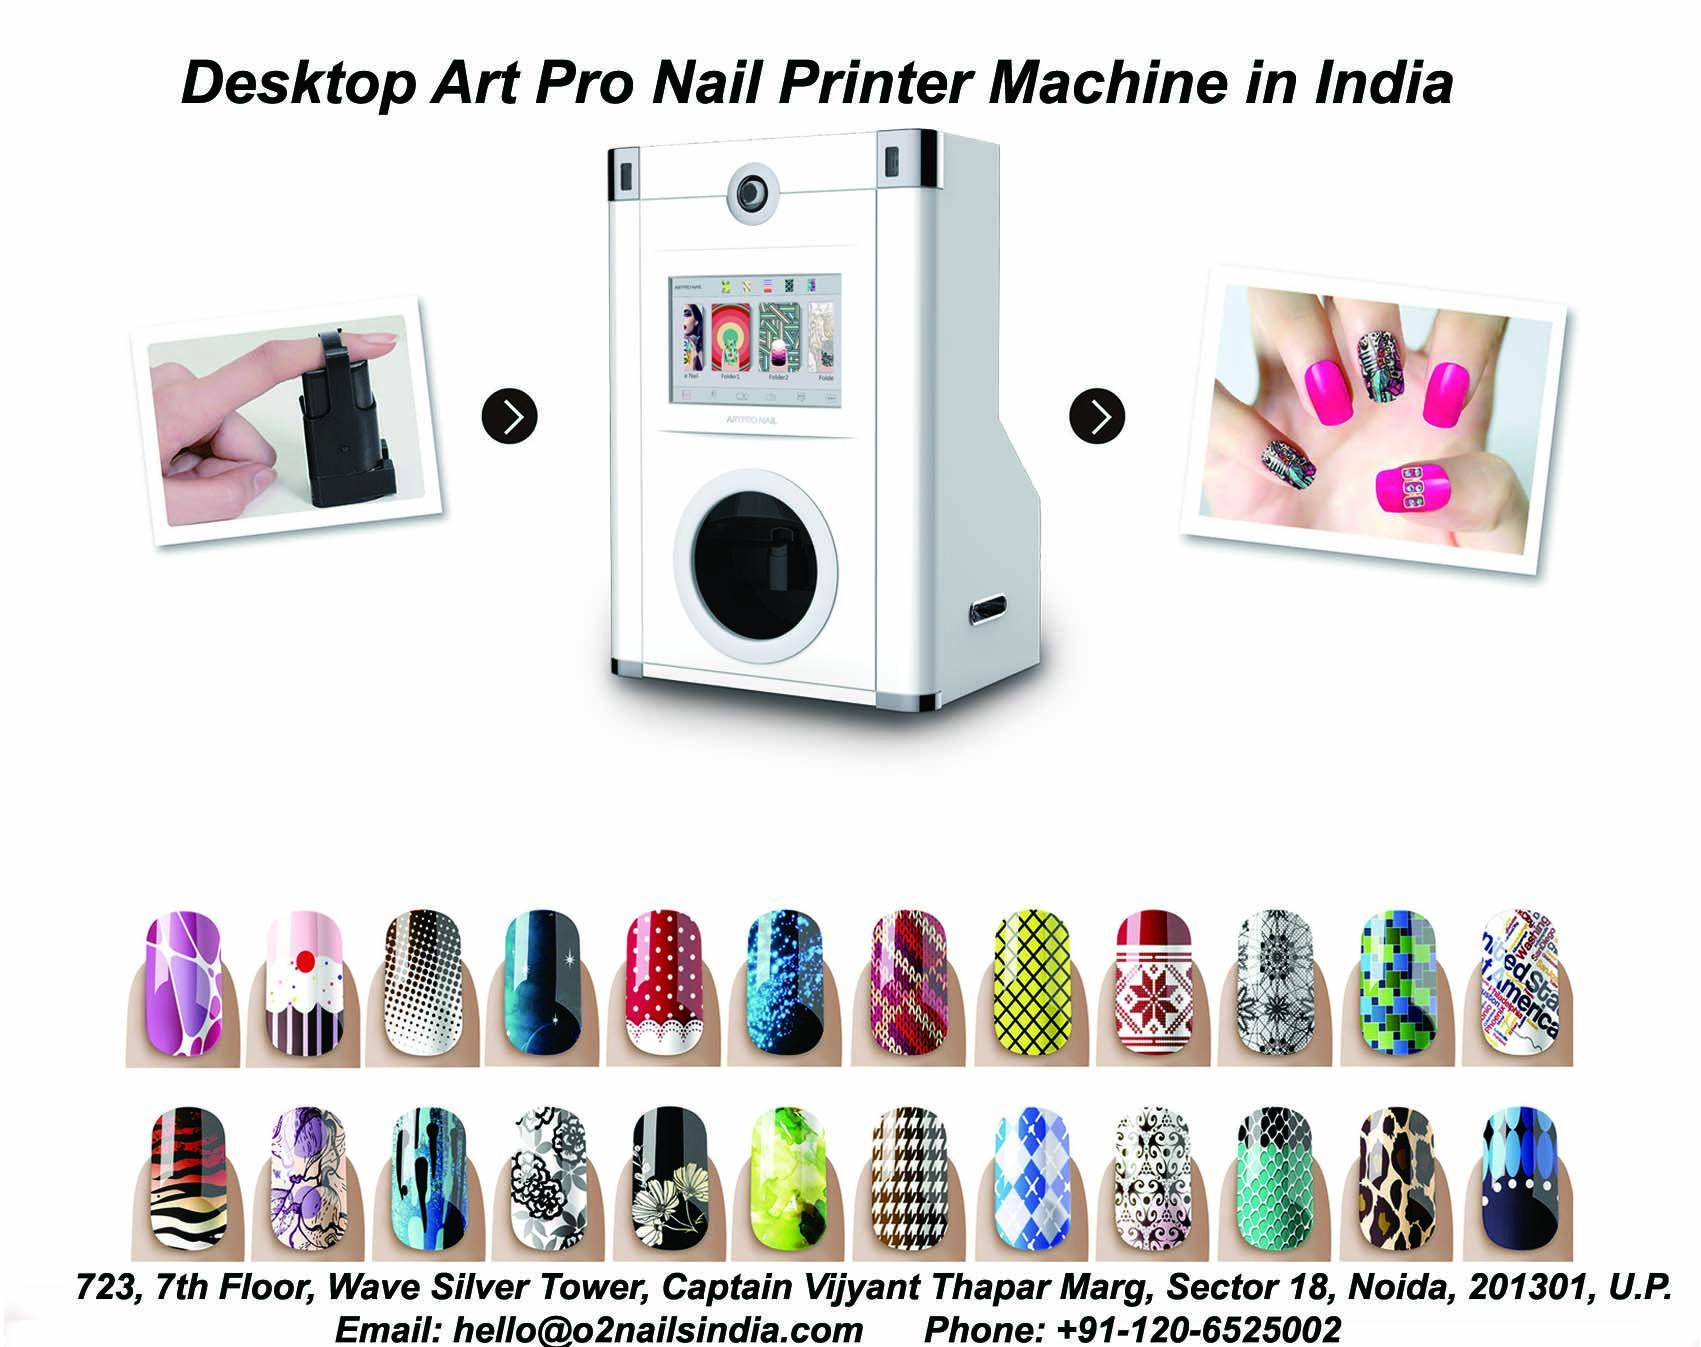 Desktop Art Pro Nail Printer Machine in India | desktop artpro nail